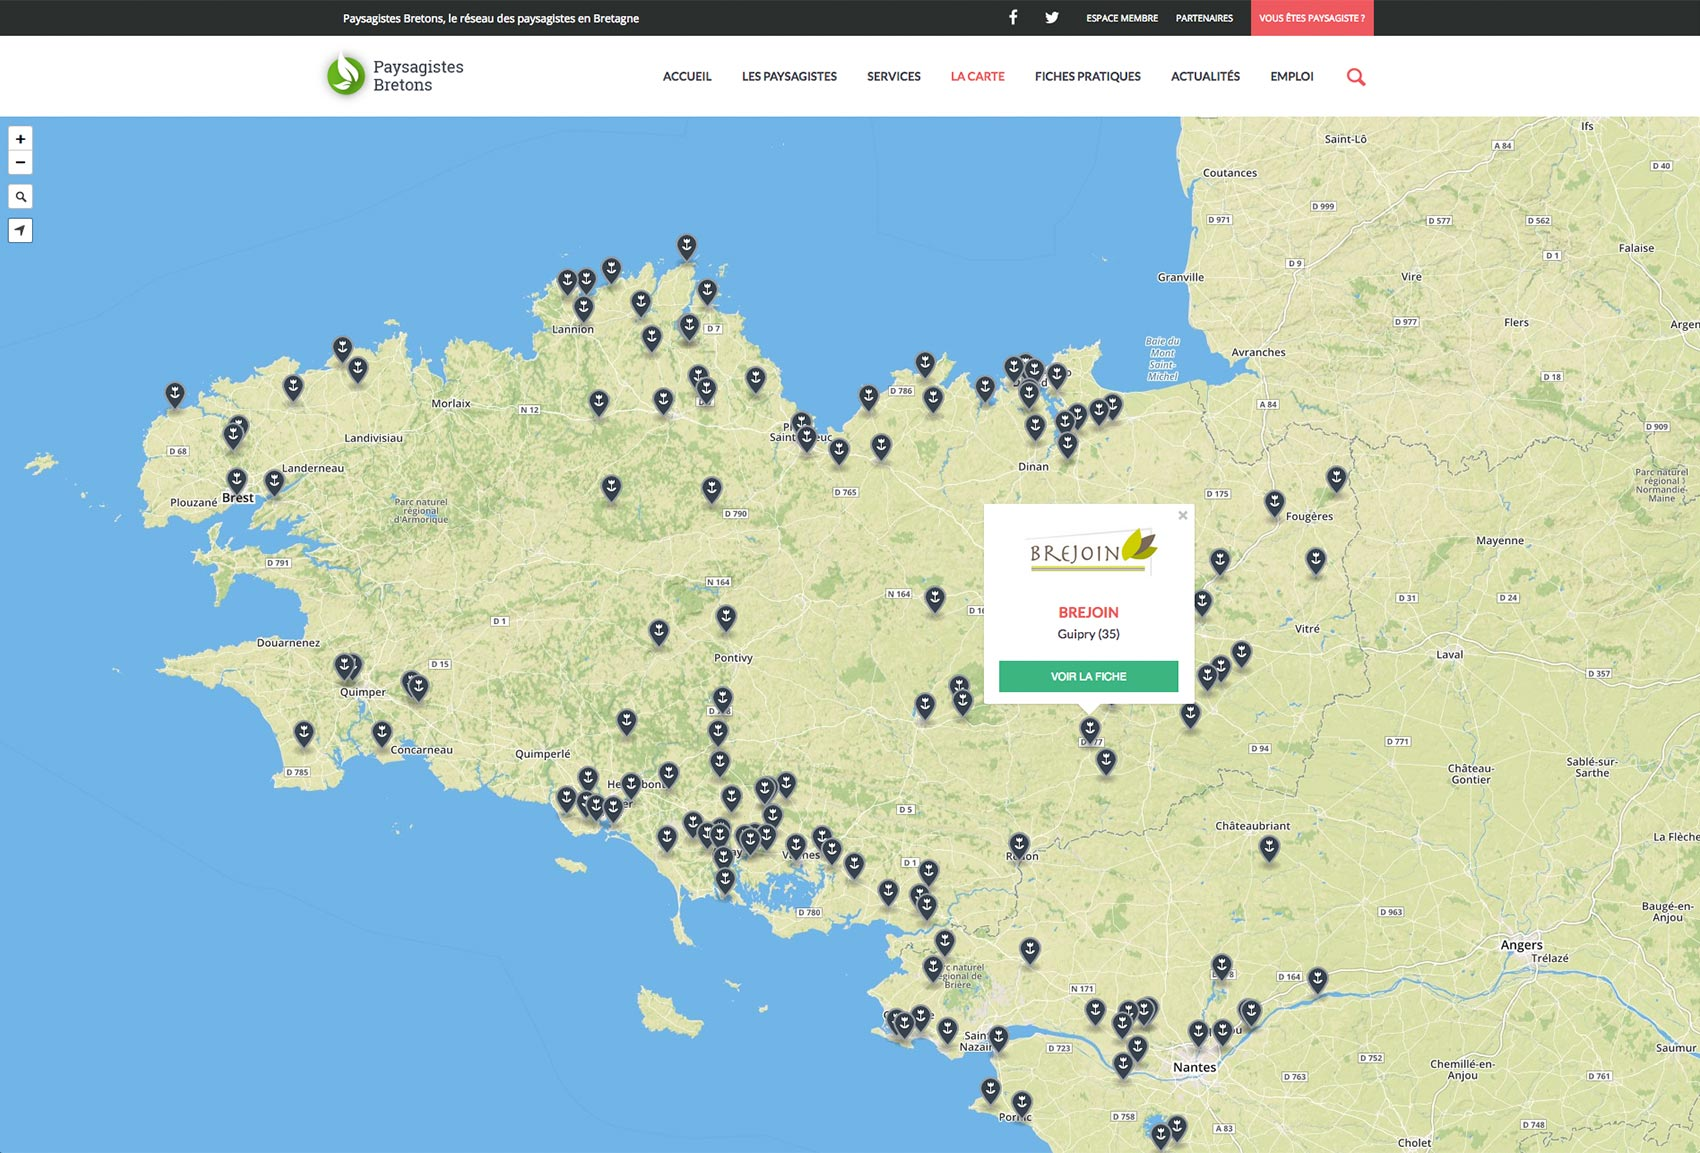 carte-paysagistes-bretons